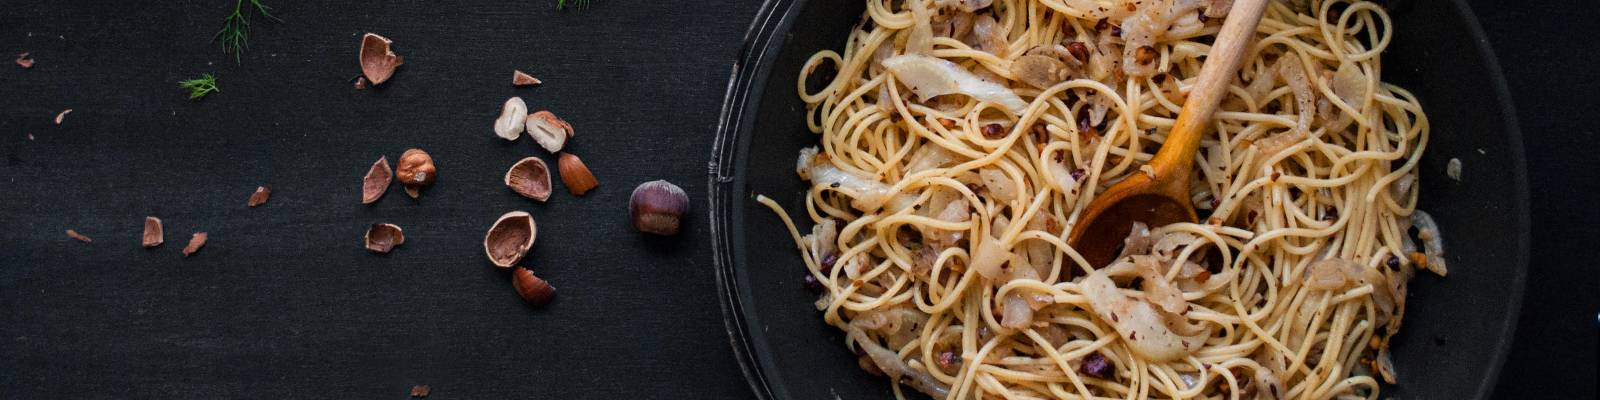 Pasta Garofalo - Spaghetti mit Fenchel in Haselnussbutter – Sara Heinen